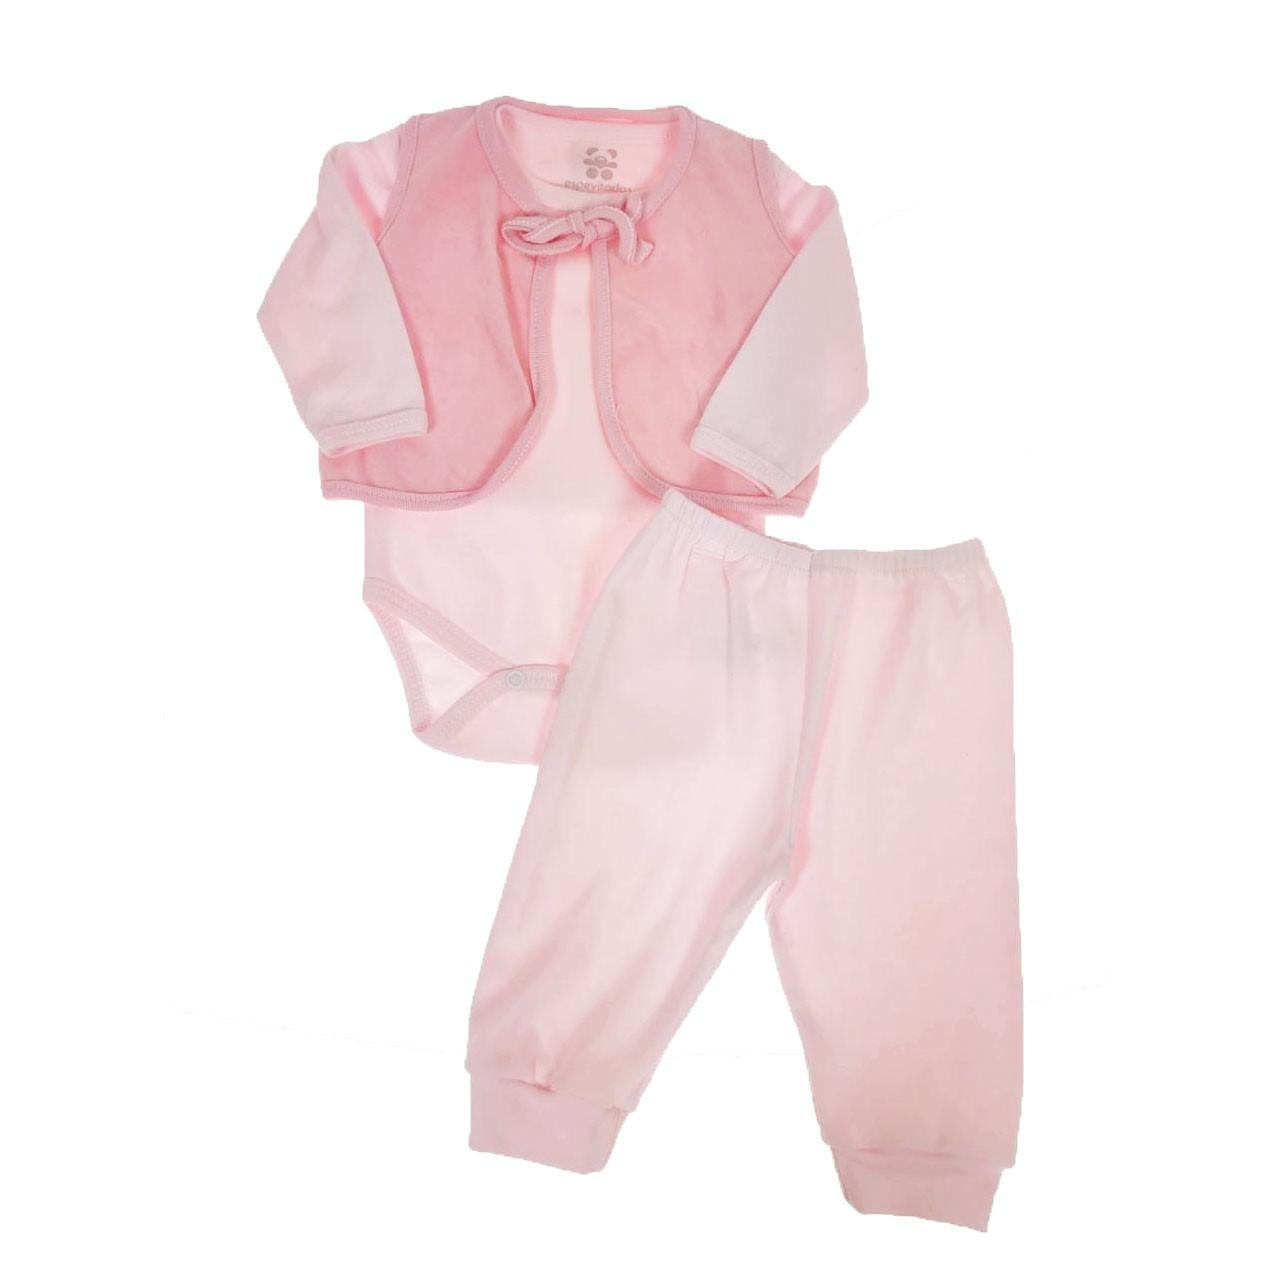 Conjunto Calça Body Casaco Rosa de Plush